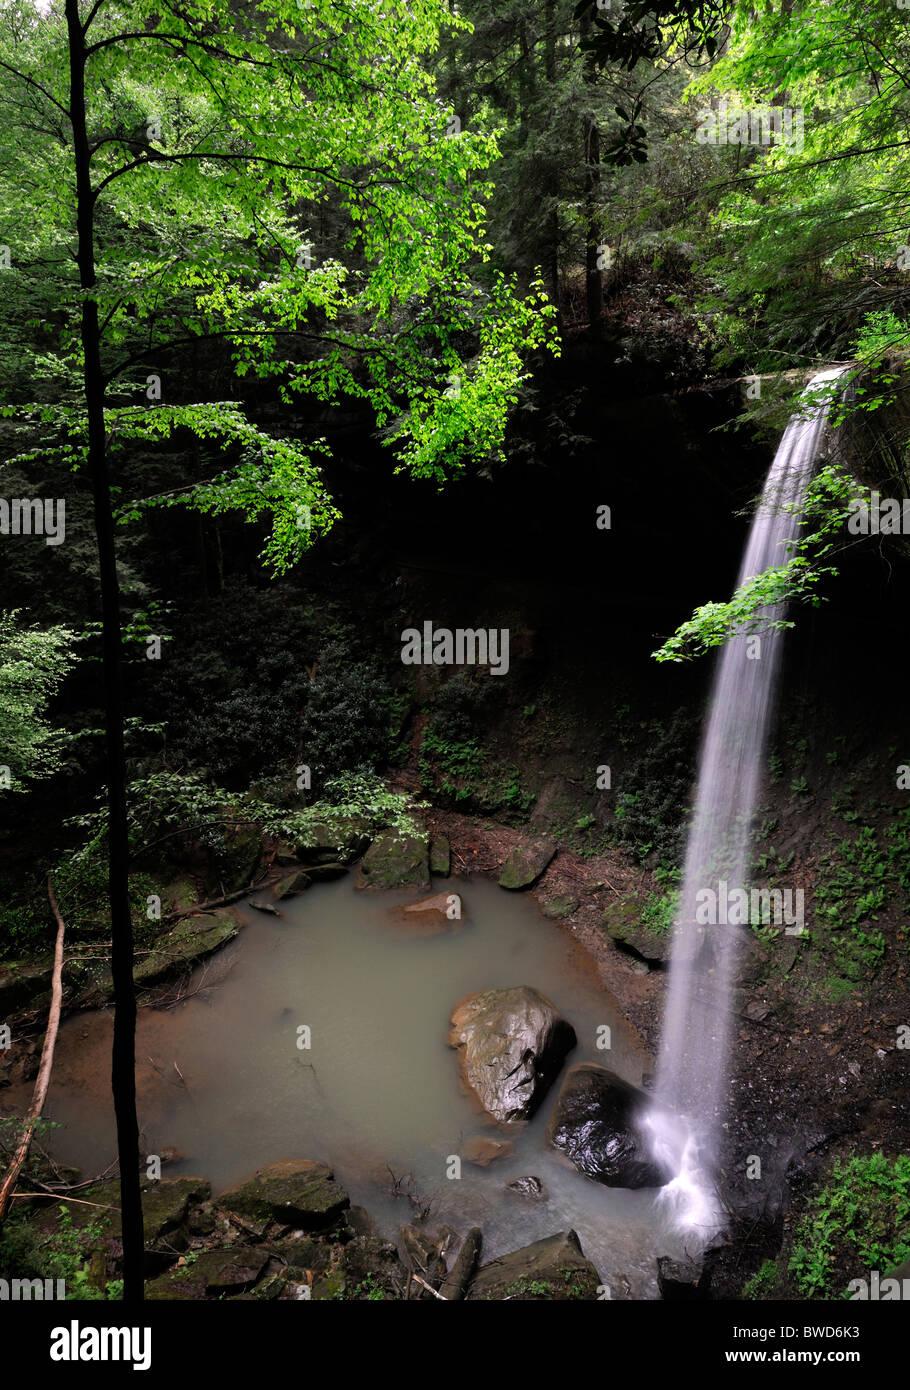 Broke leg broken leg falls waterfall Menifee county Kentucky USA - Stock Image